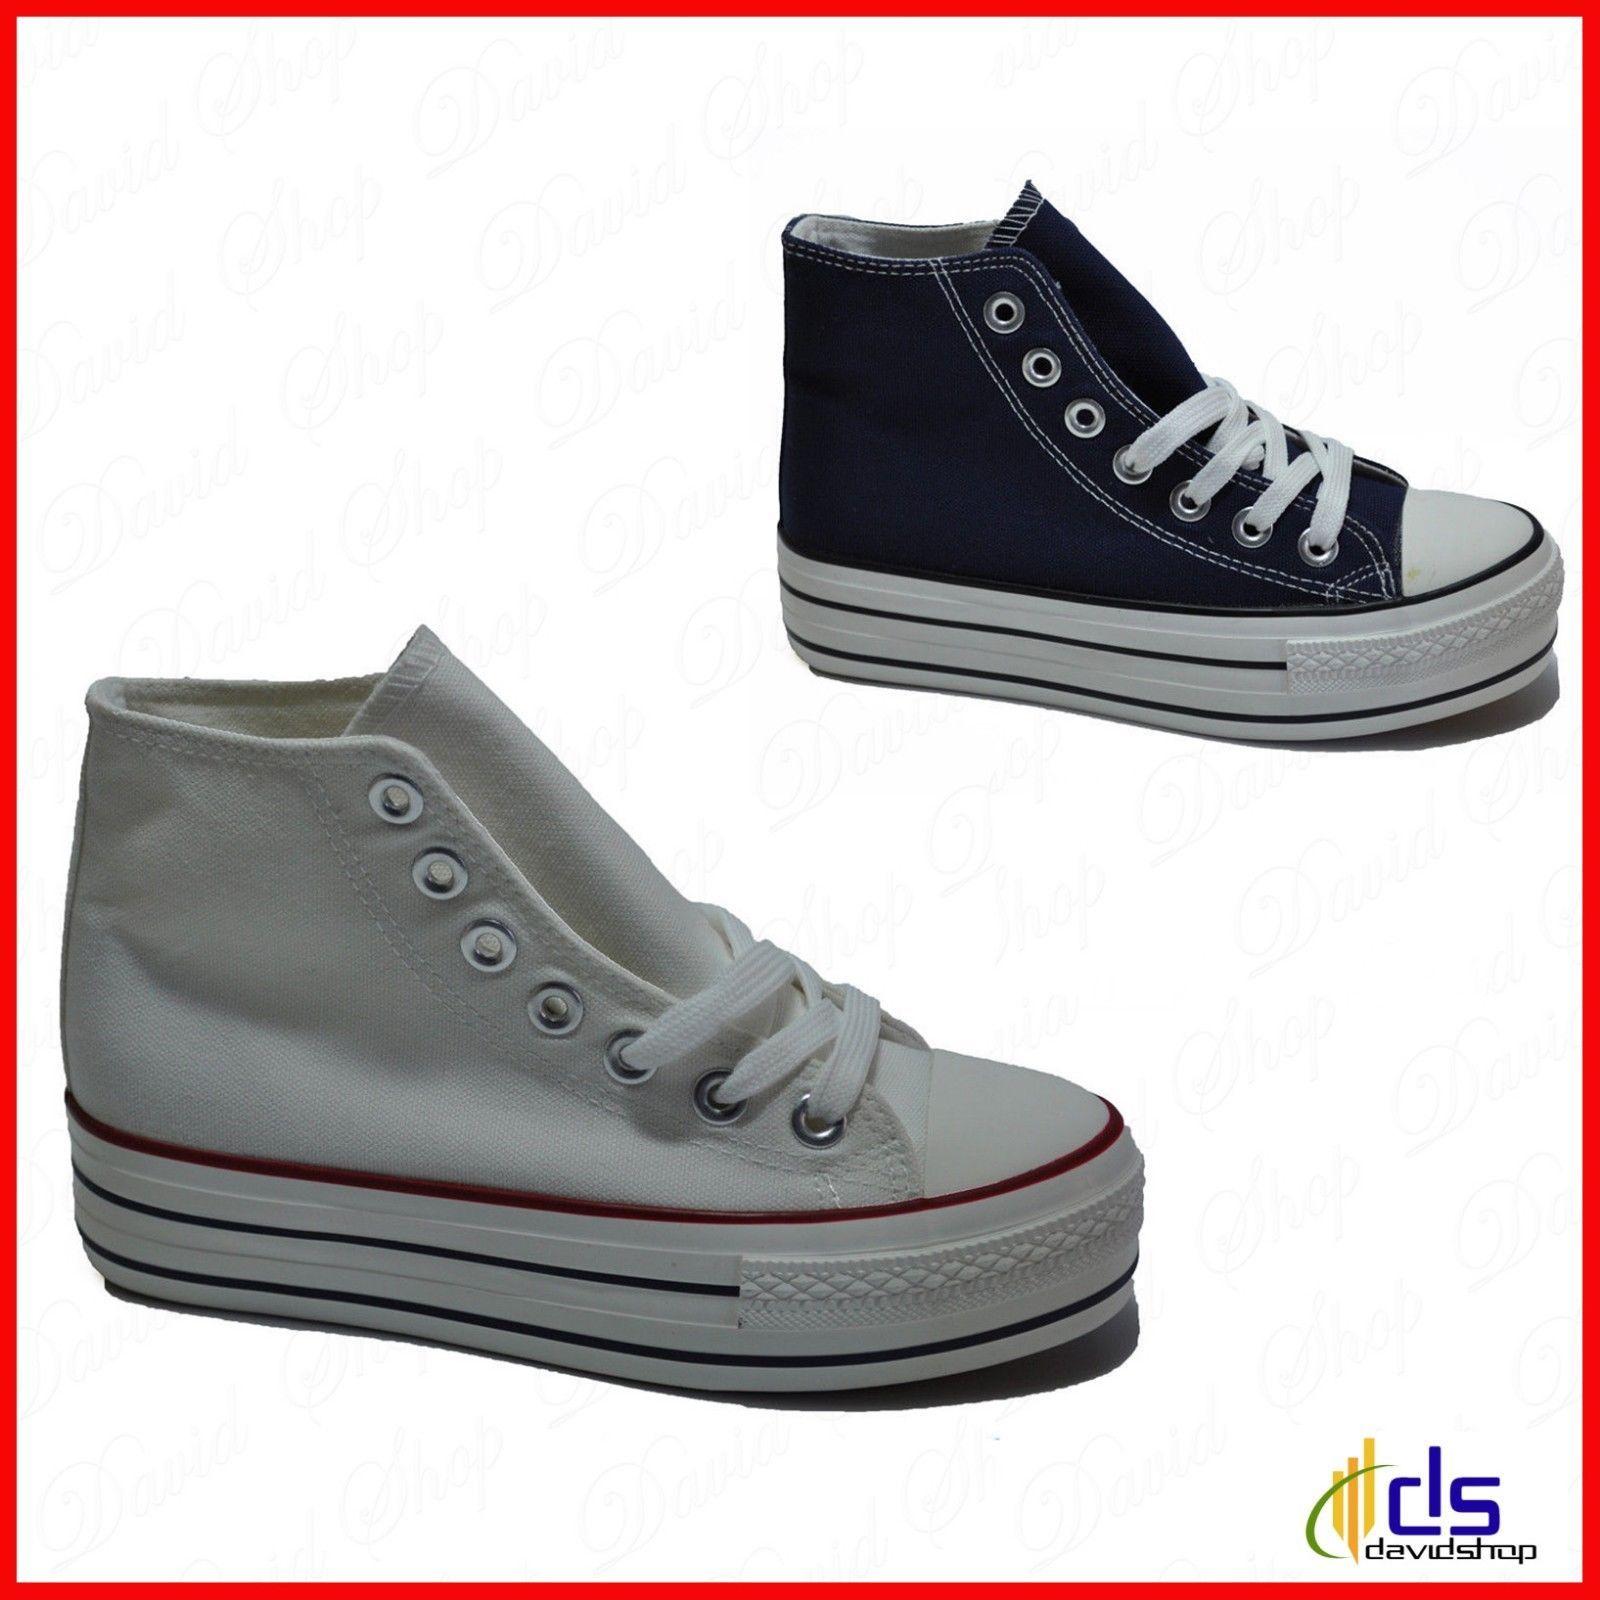 scarpe tela donna adidas